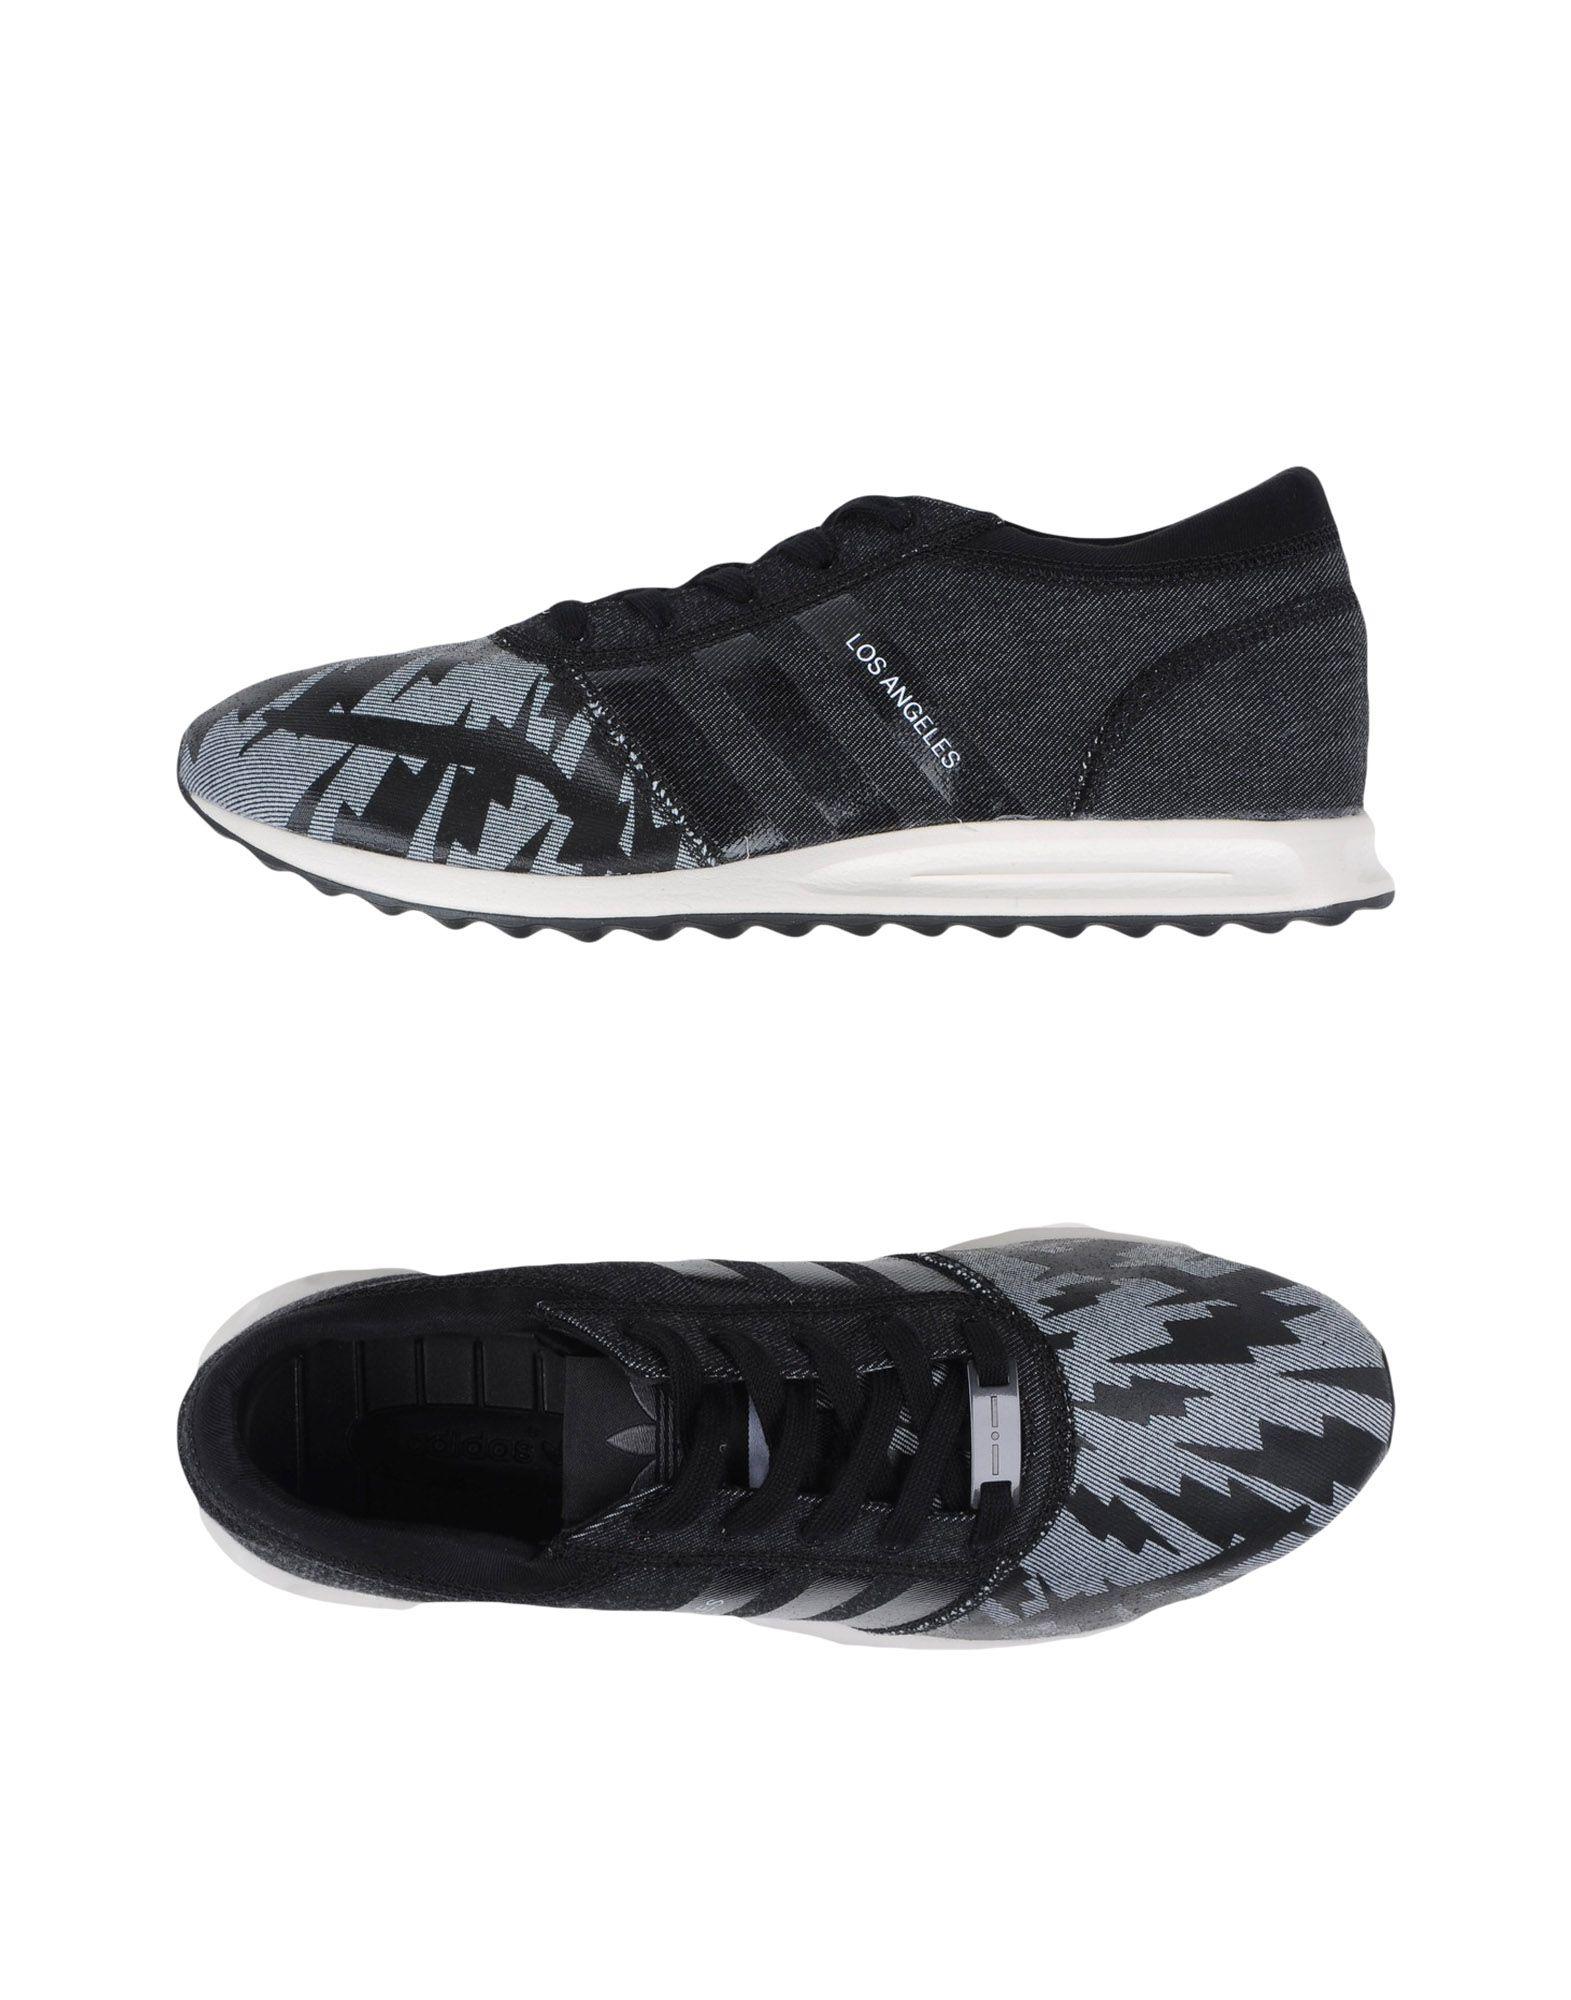 Sneakers Adidas Originals Los Angeles - Homme - Sneakers Adidas Originals sur